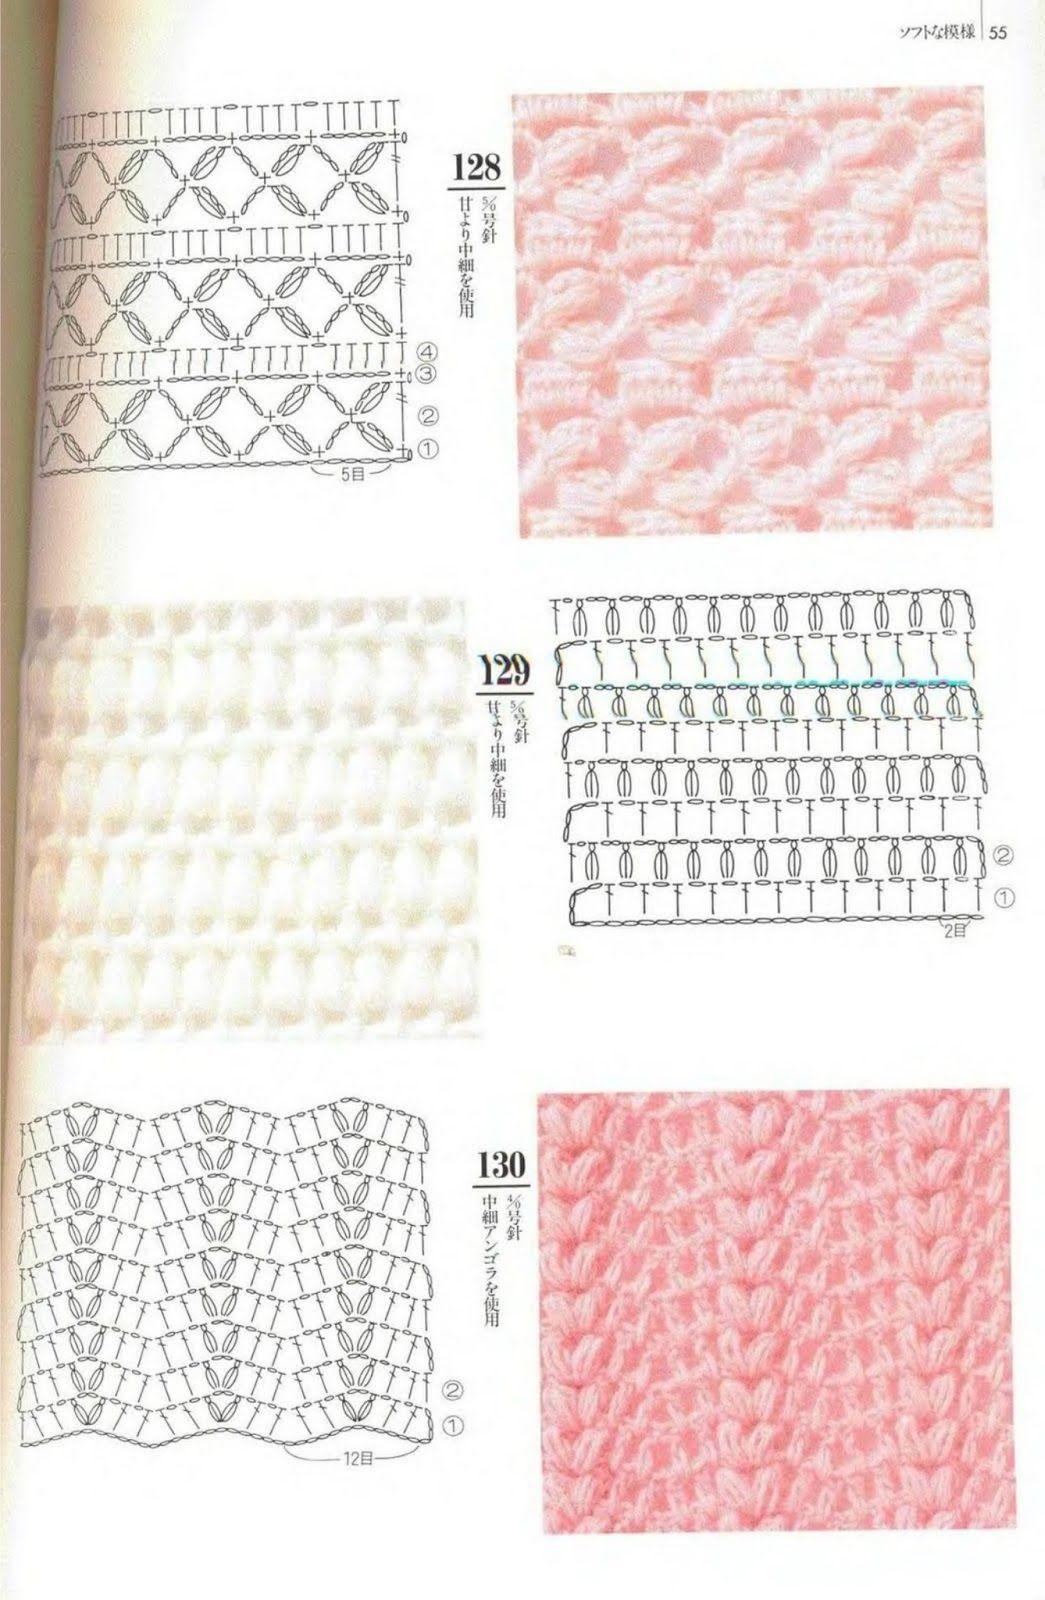 SOLO PUNTOS: Crochet Zigzag | crochet patrones | Pinterest ...